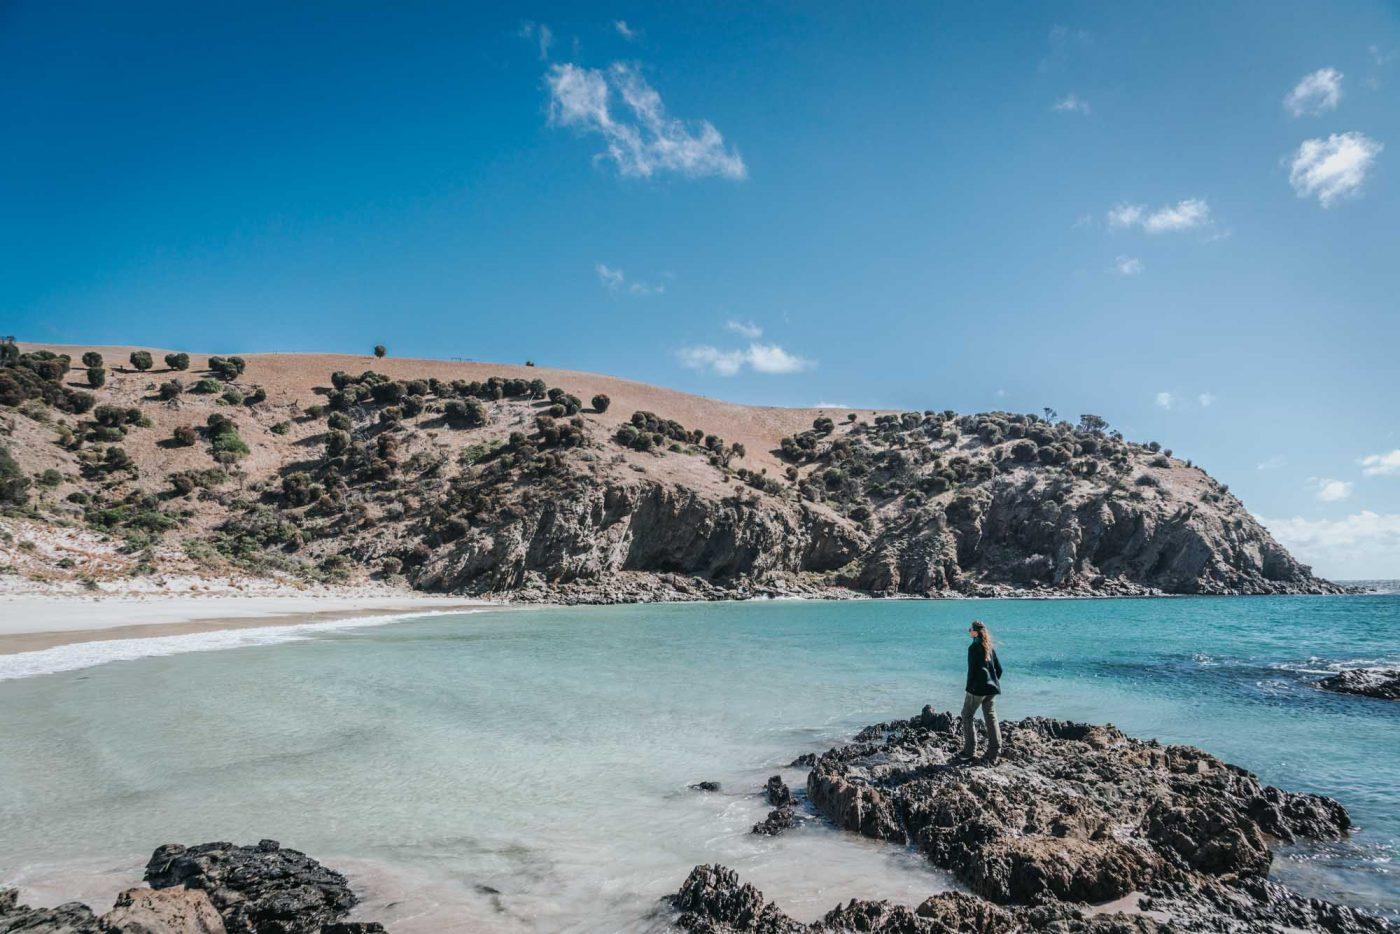 Things to do on Kangaroo Island